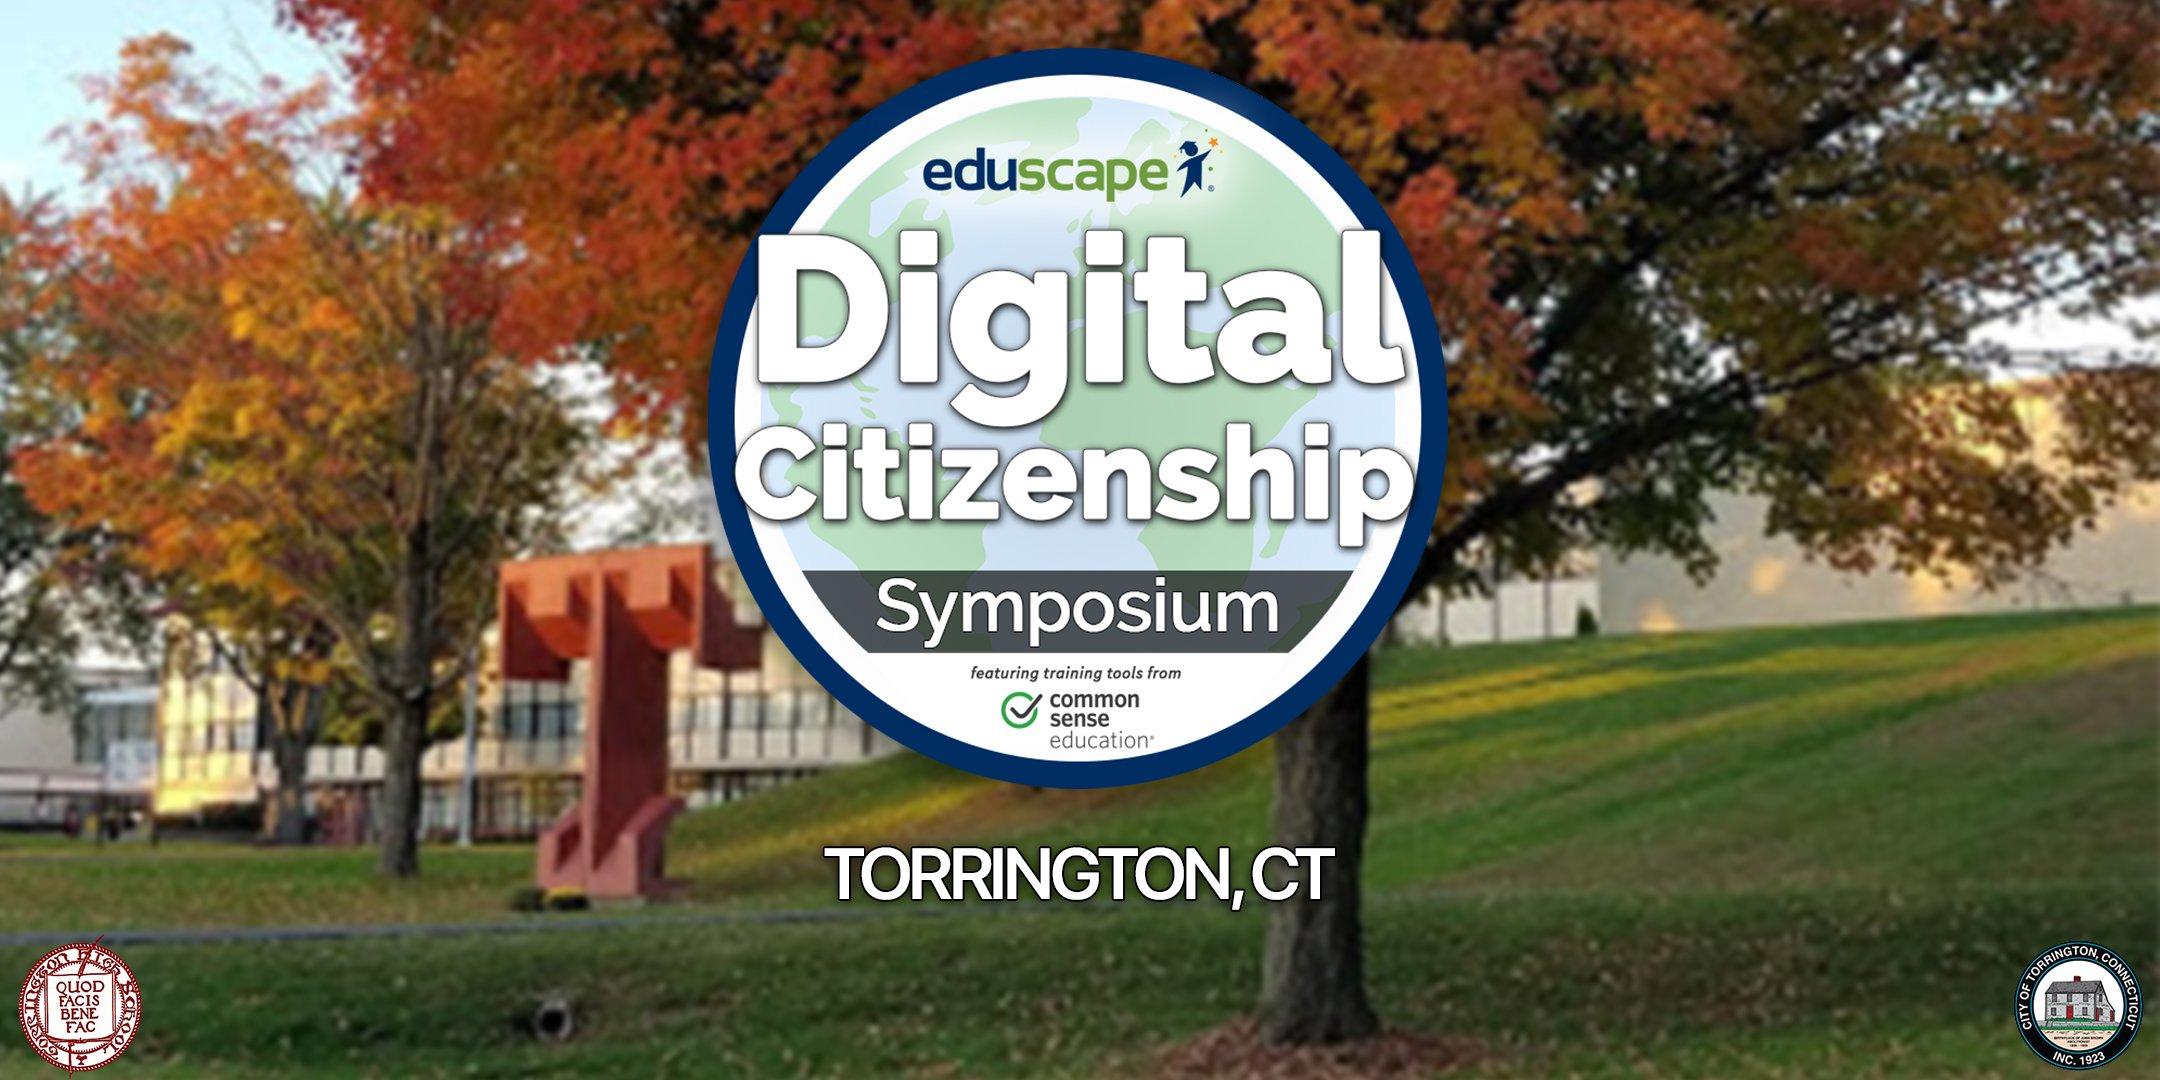 digital citizenship symposium | Eduscape